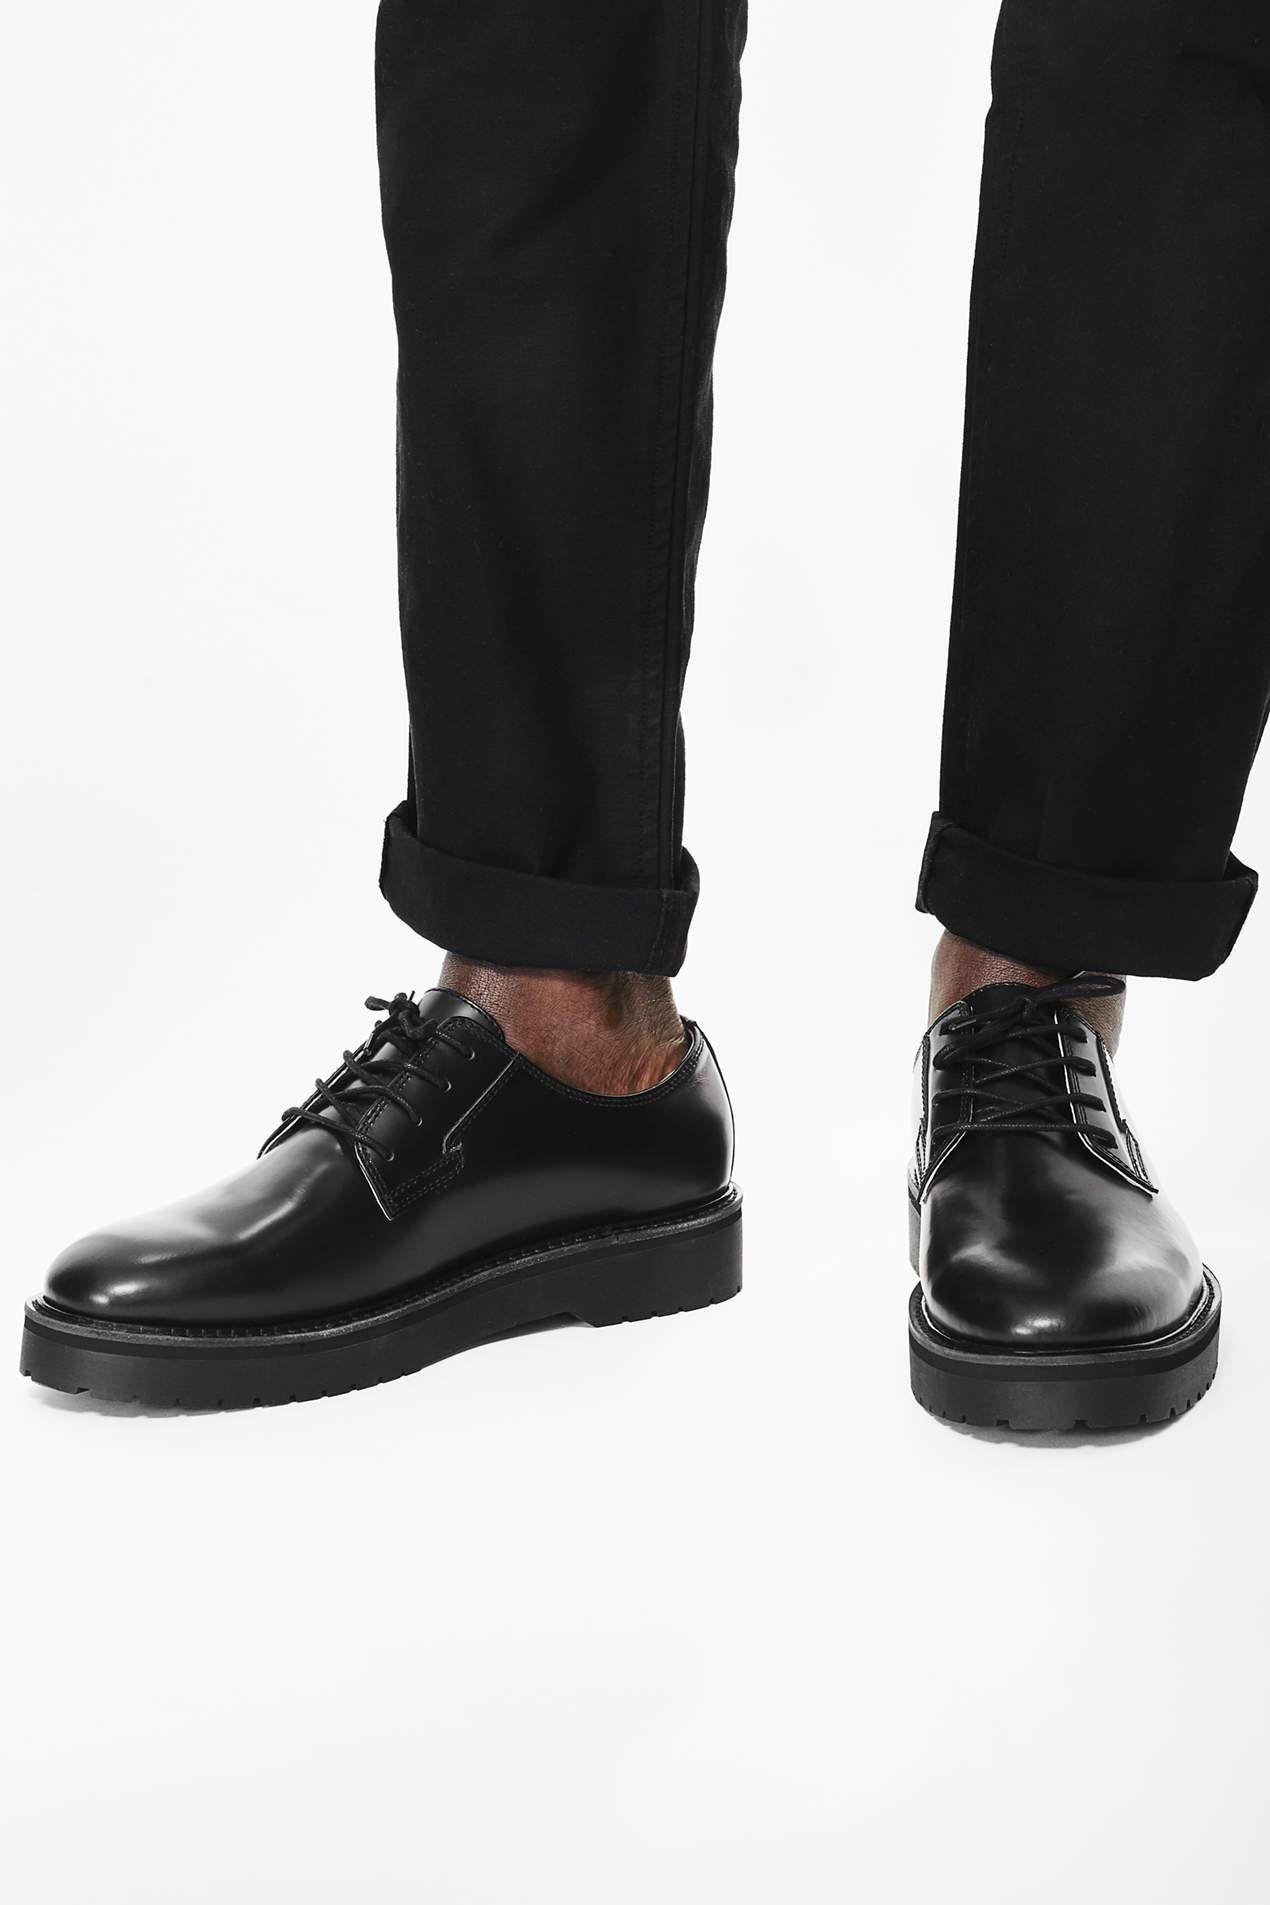 Ali Leather Shoes – Balance